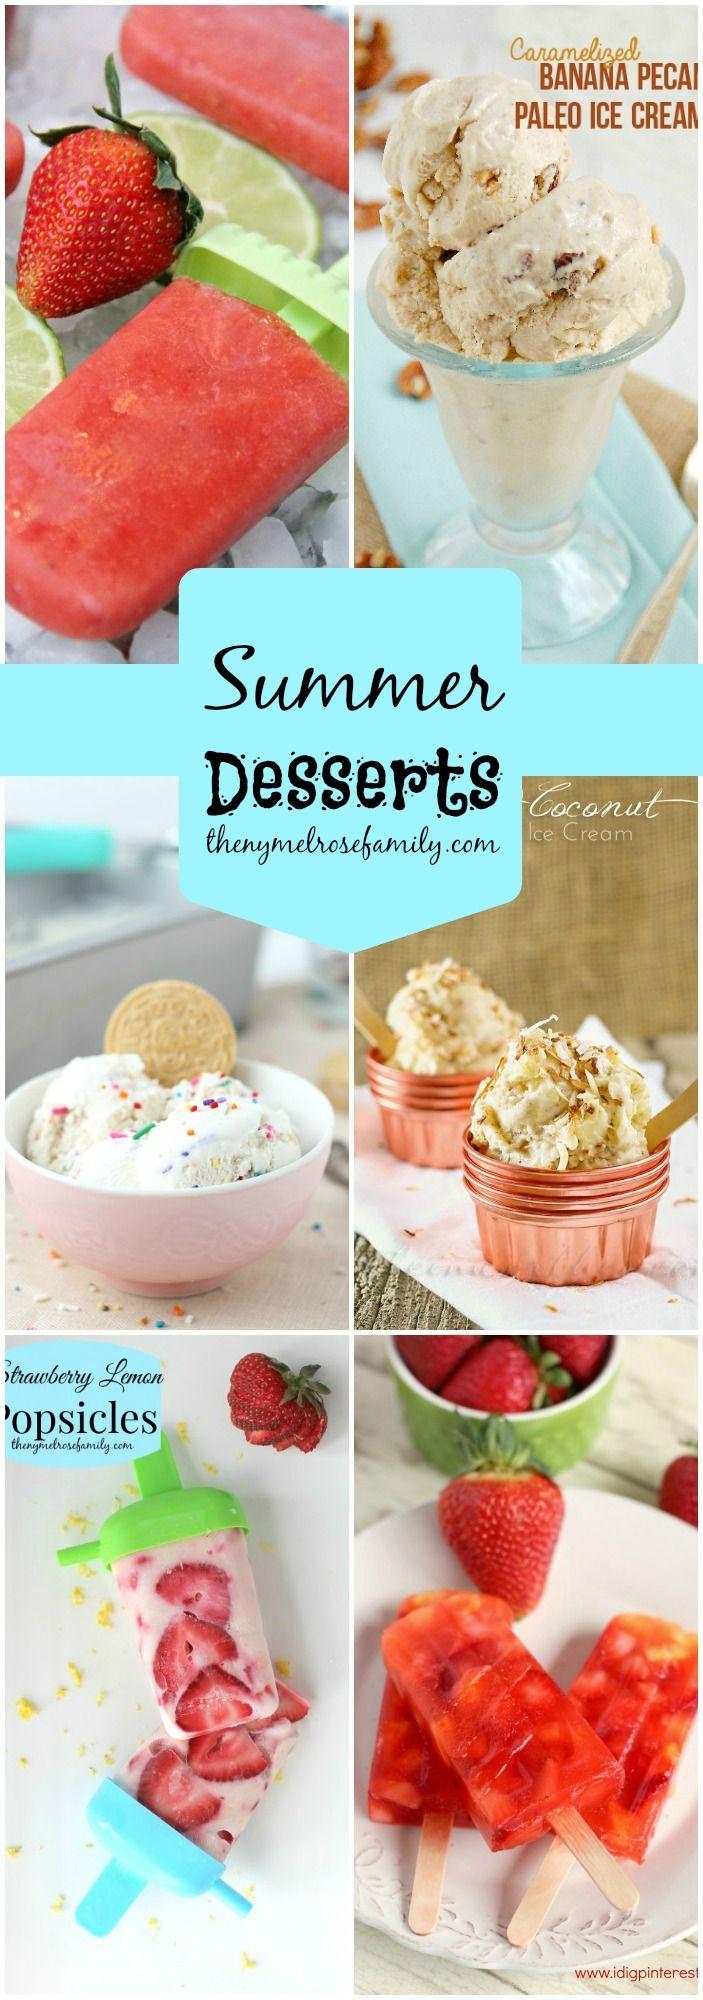 Summer Desserts www.thenymelrosefamily.com #popsicles #icecream #summer_desserts